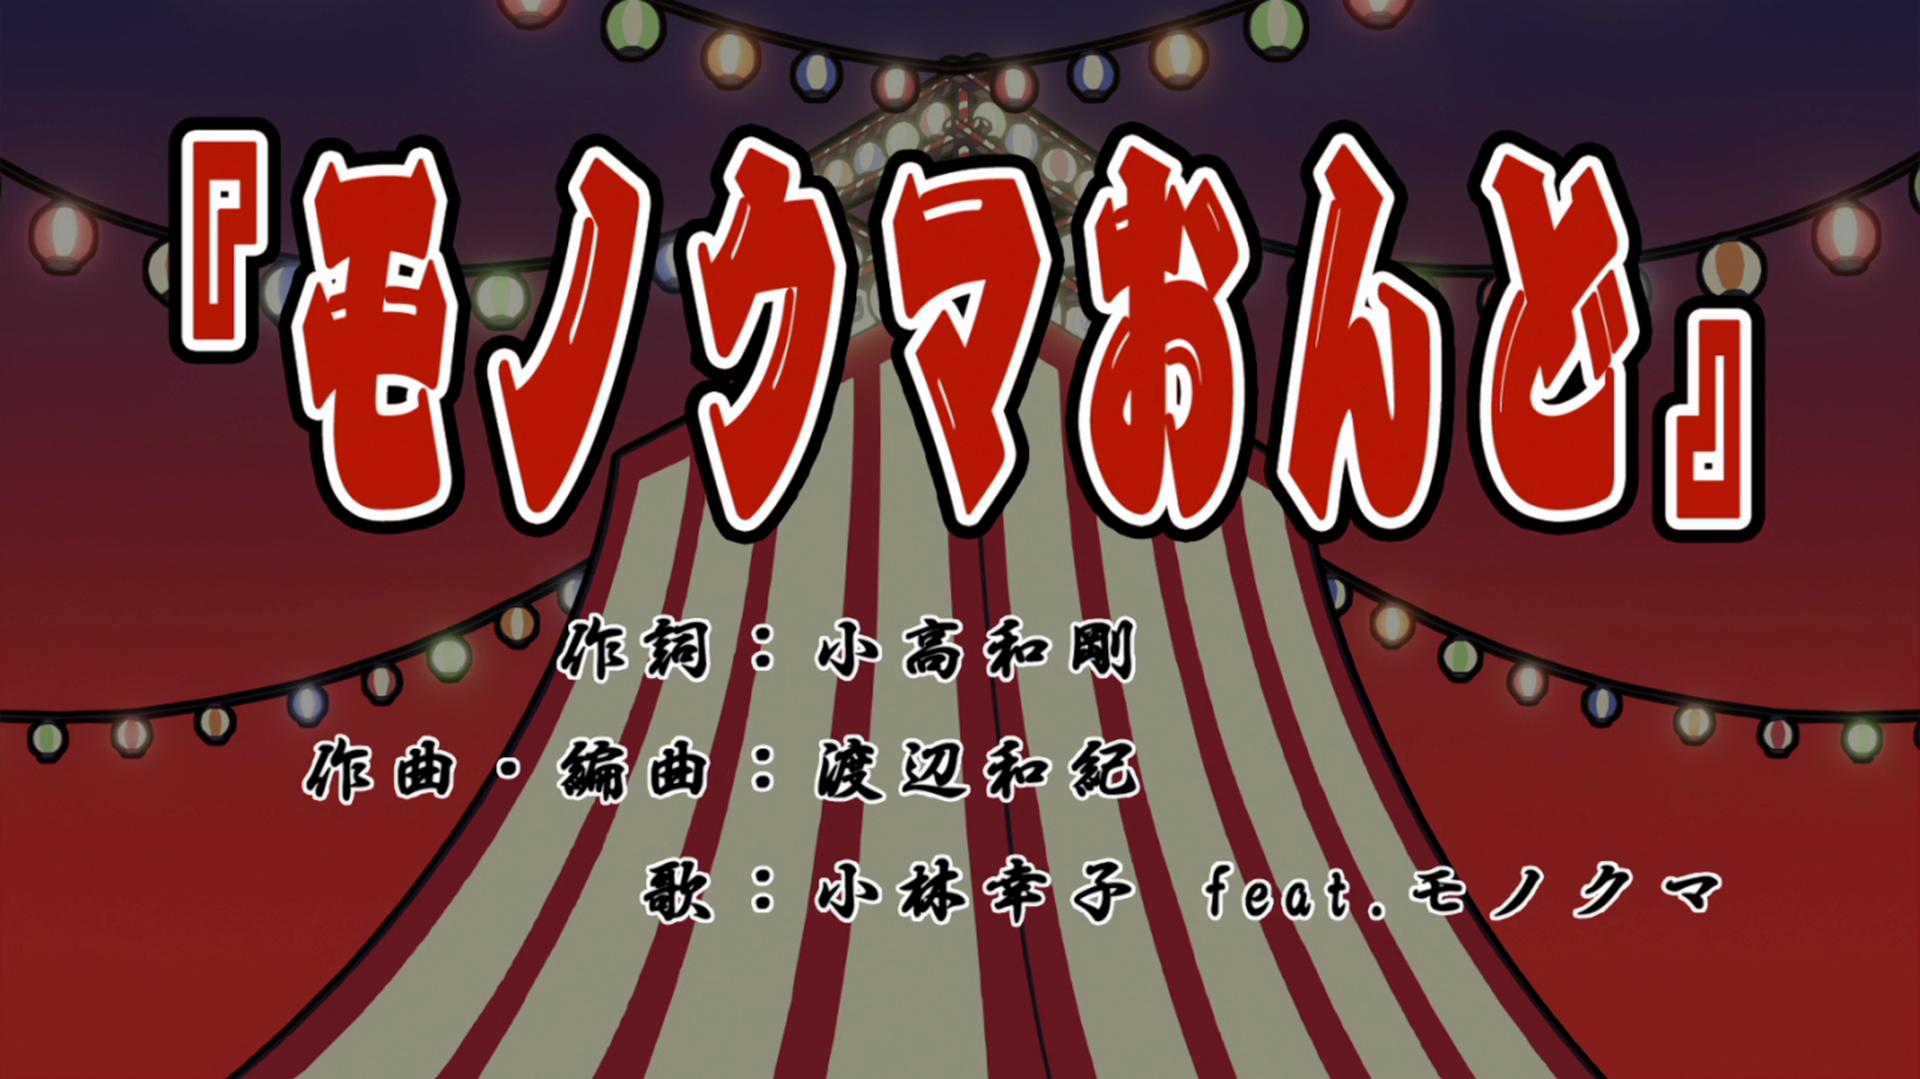 Danganronpa The Animation - Monokuma Song